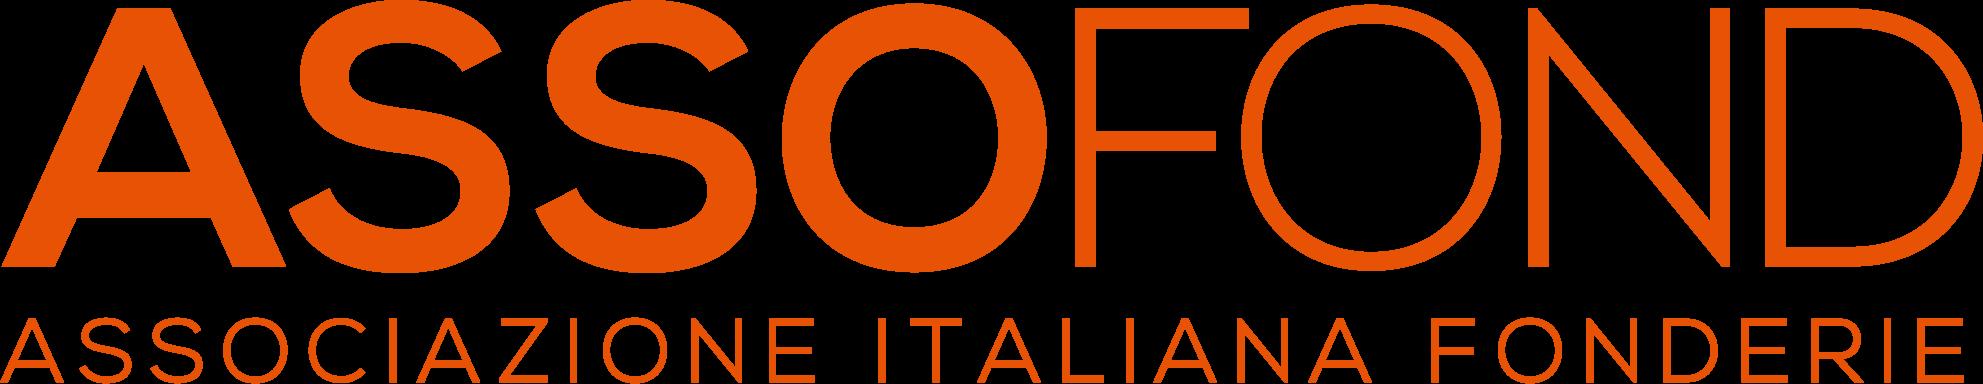 Italian Foundry Federation (ASSOFOND)